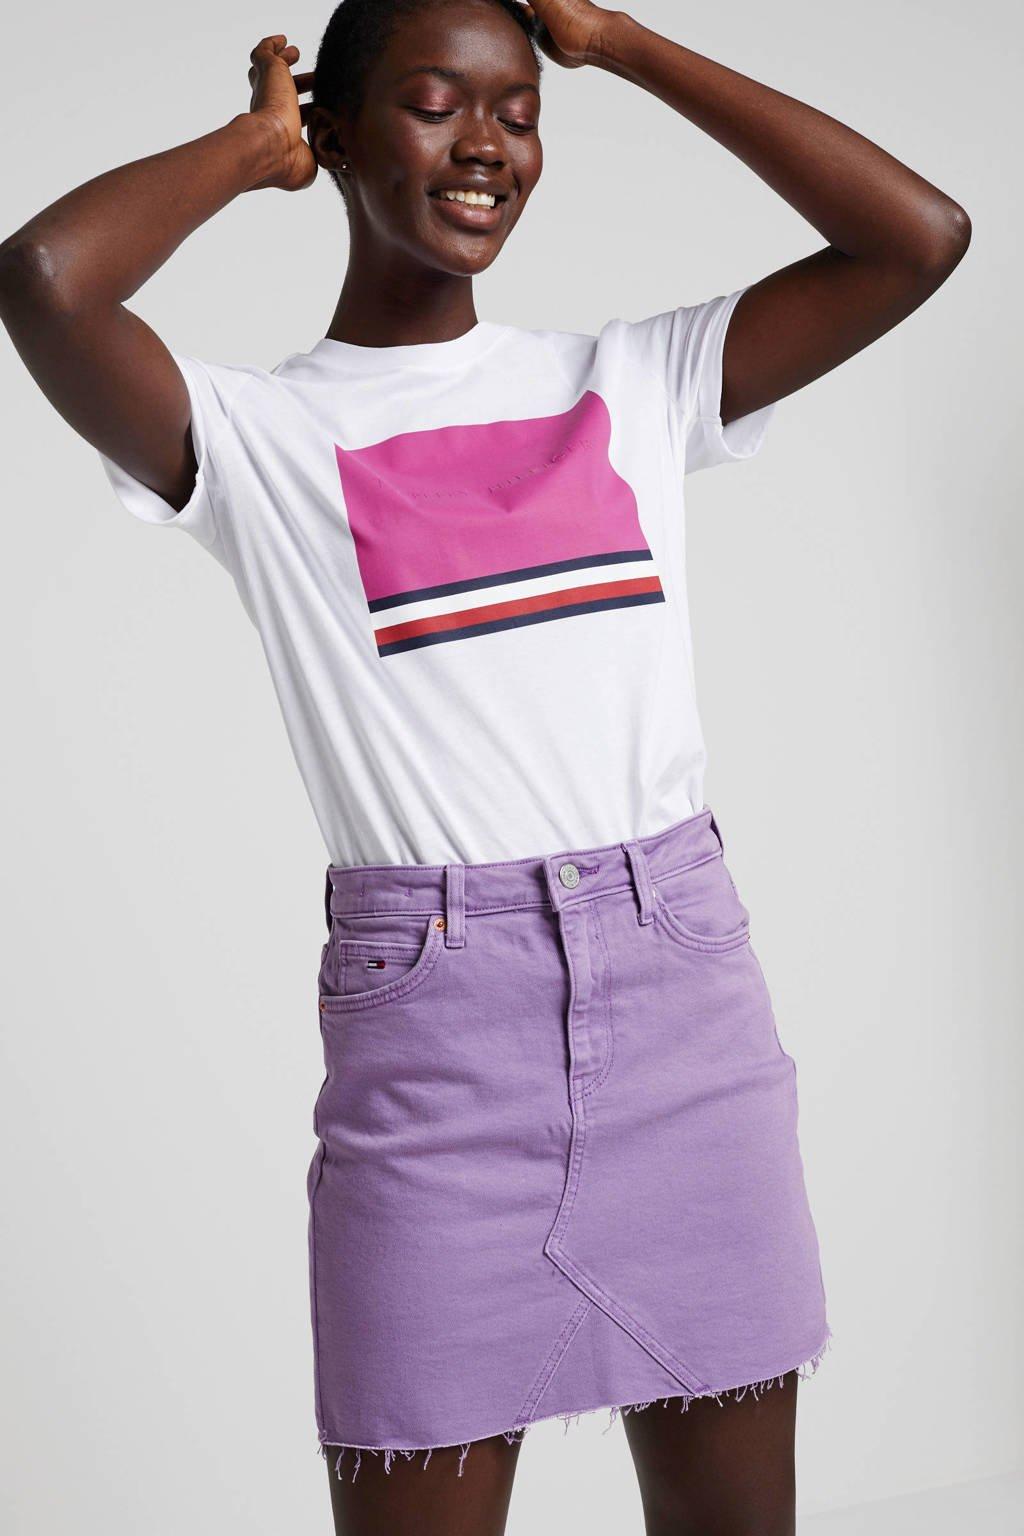 Tommy Hilfiger T-shirt van biologisch katoen wit/roze, Wit/roze